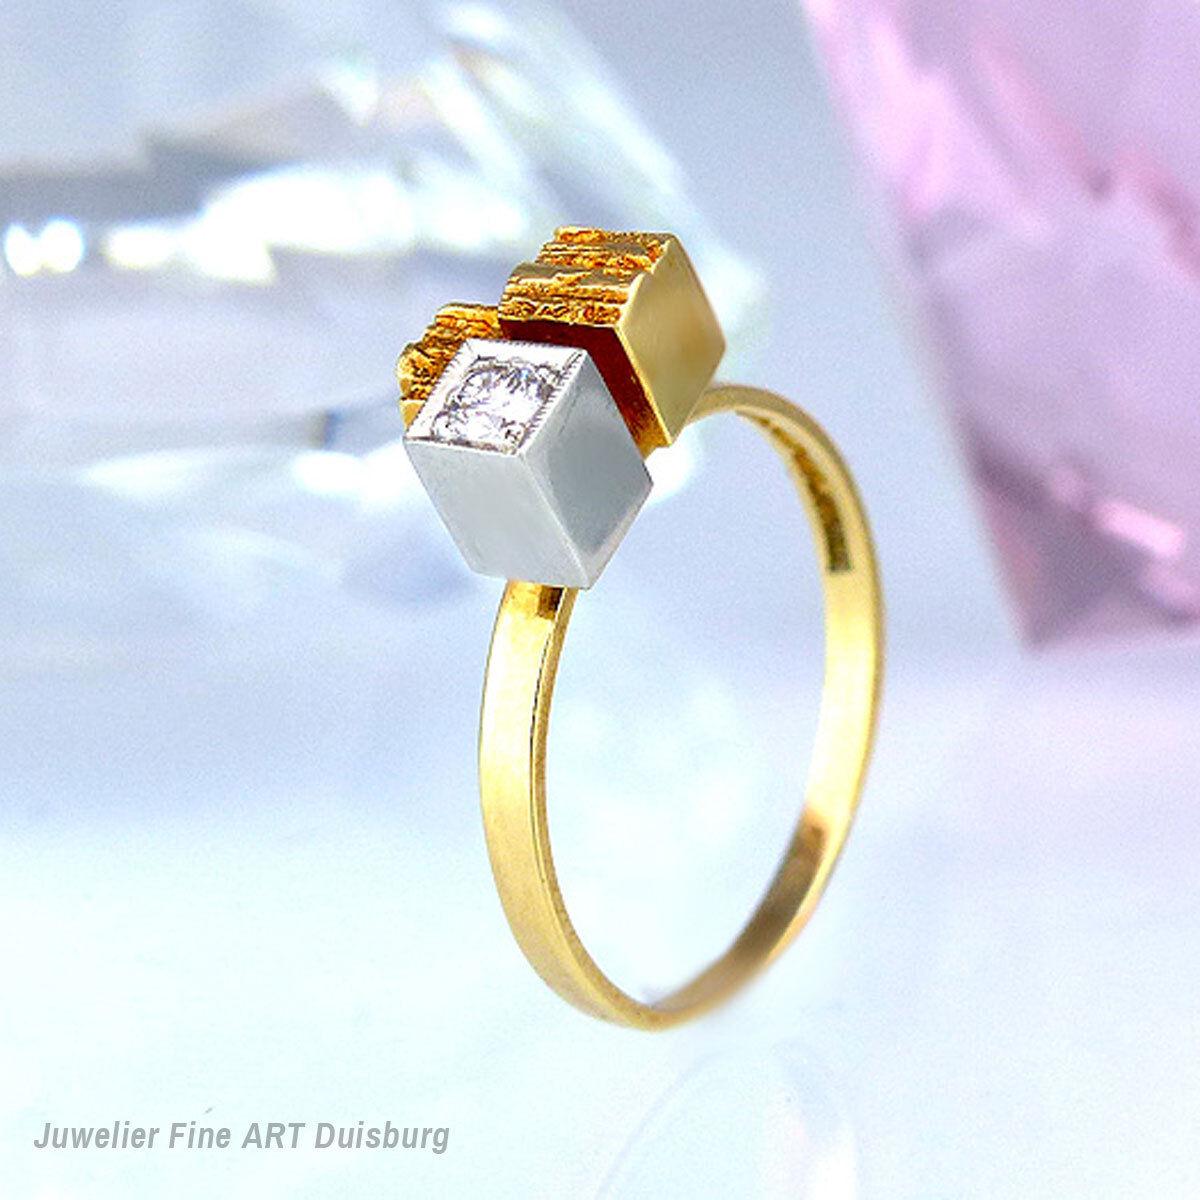 Lapponia Ring  Diamond Turret  750 - GG mit 1 Diamant 0,09 ct. Top Wesselton VVS